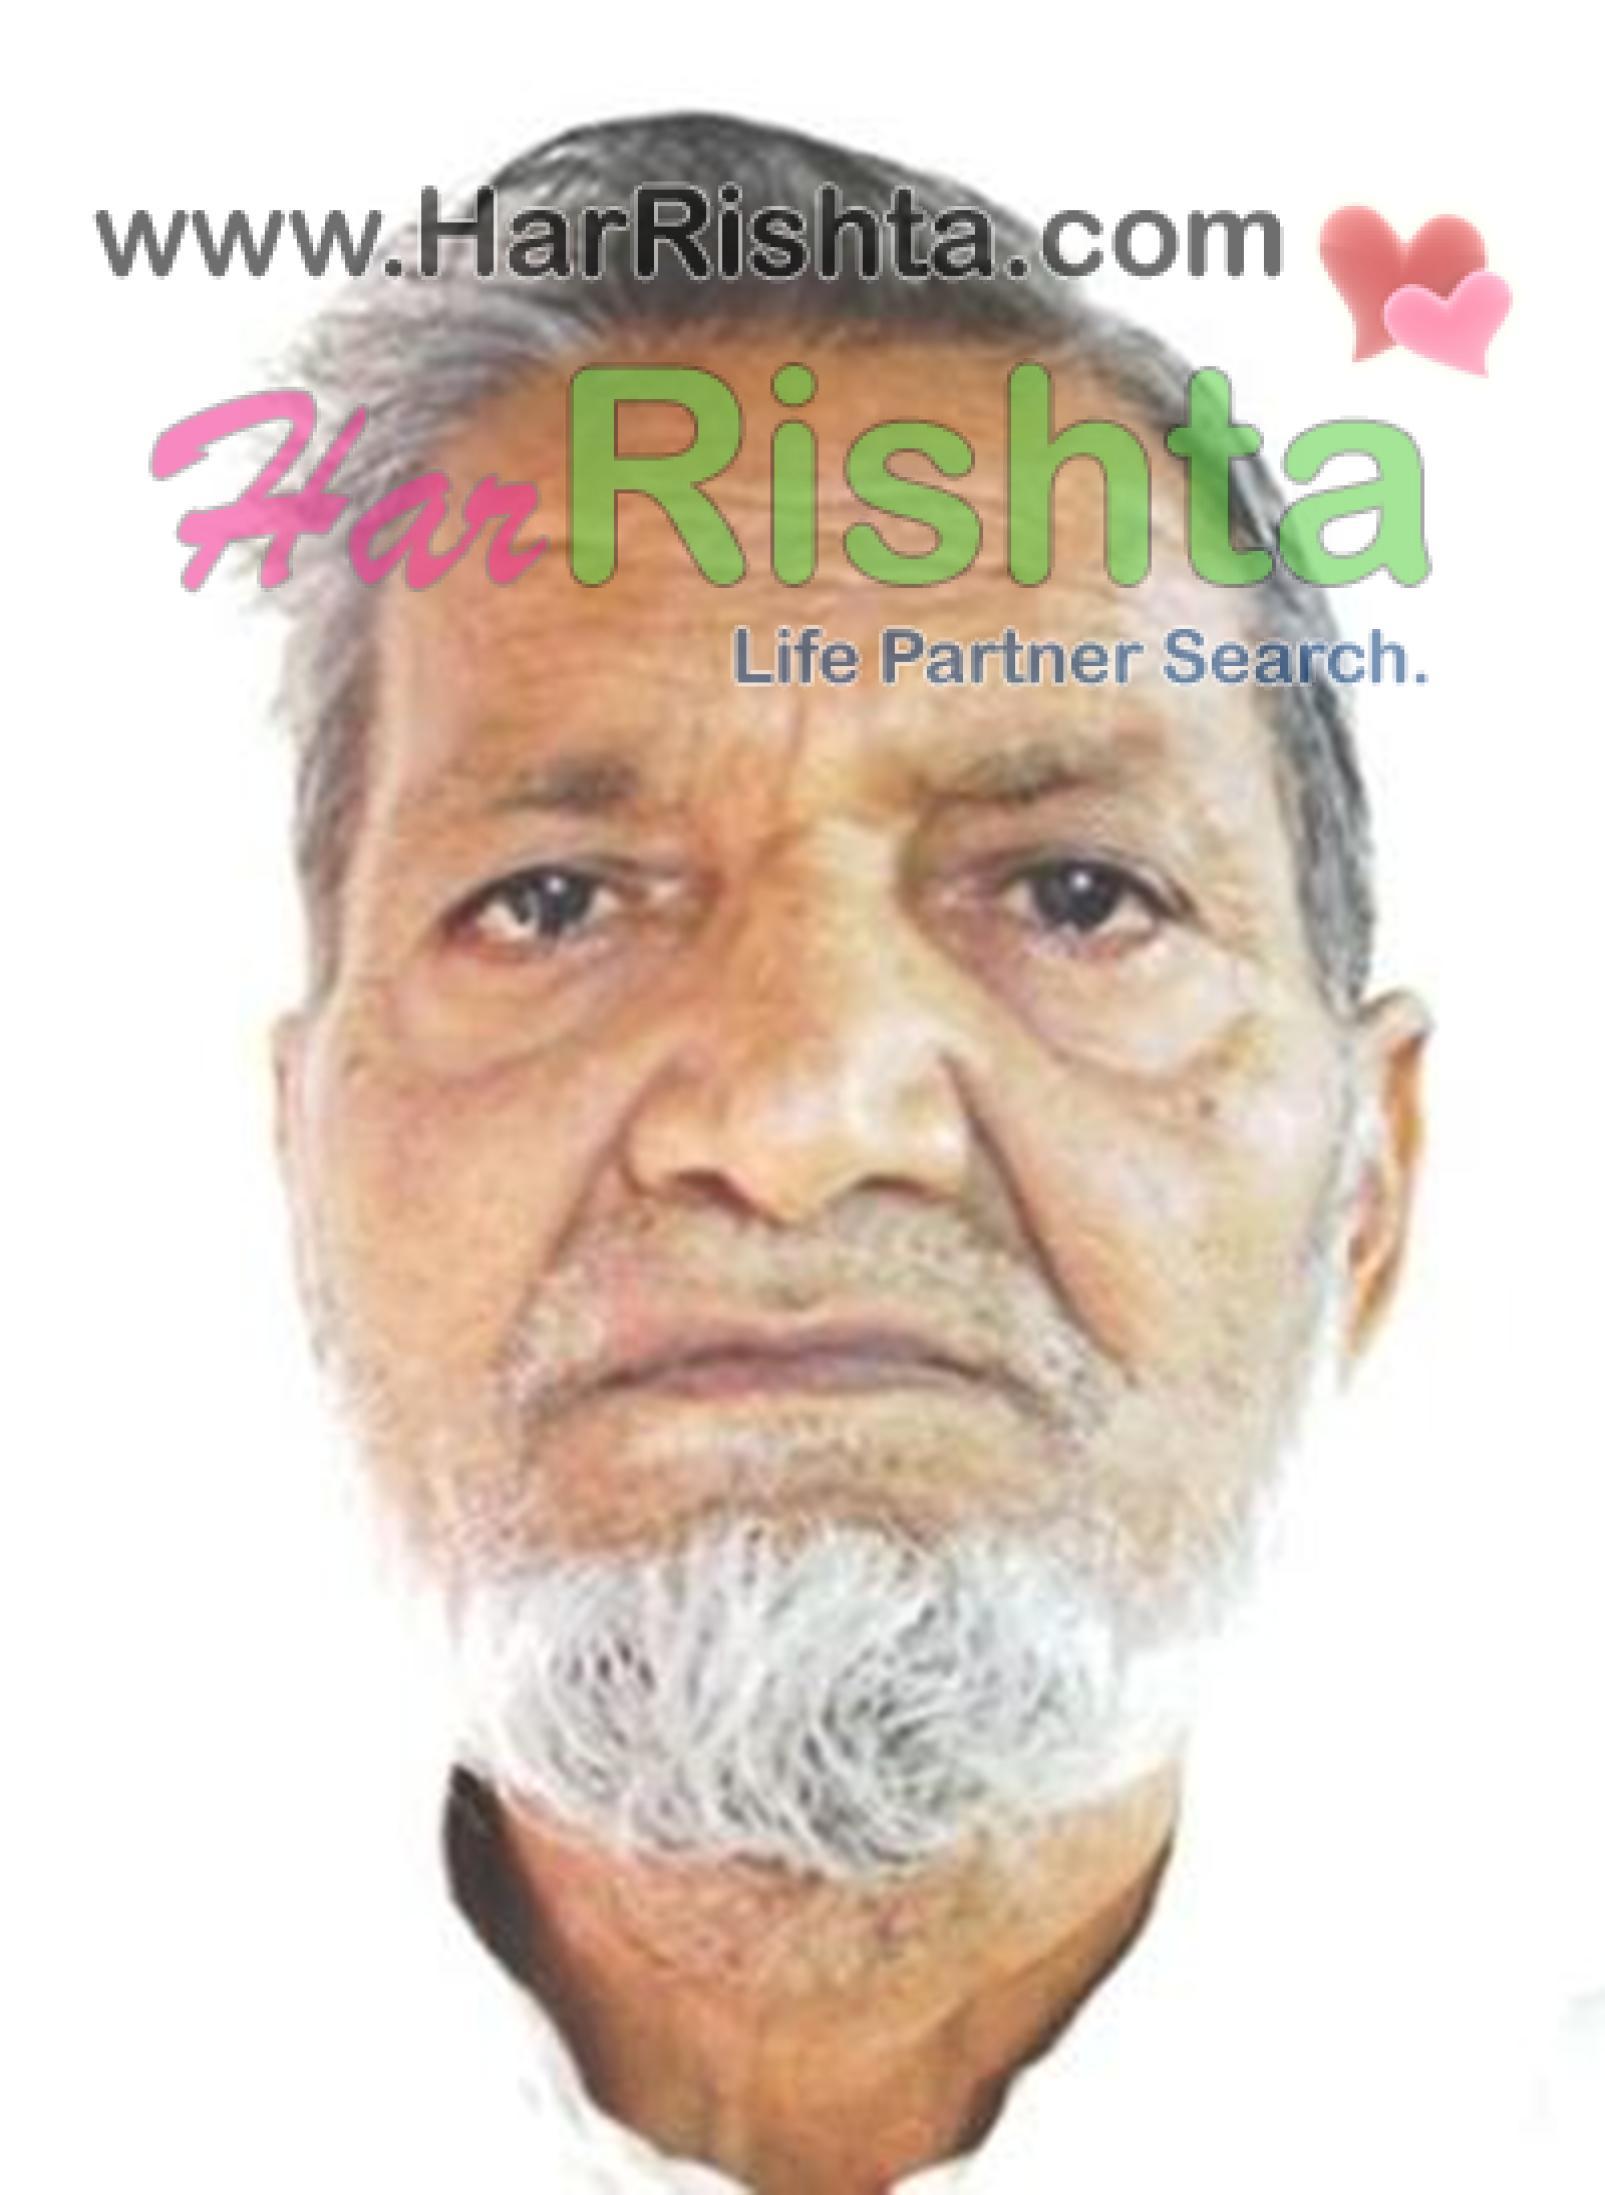 Syed Boy Rishta in Mirpur Khas